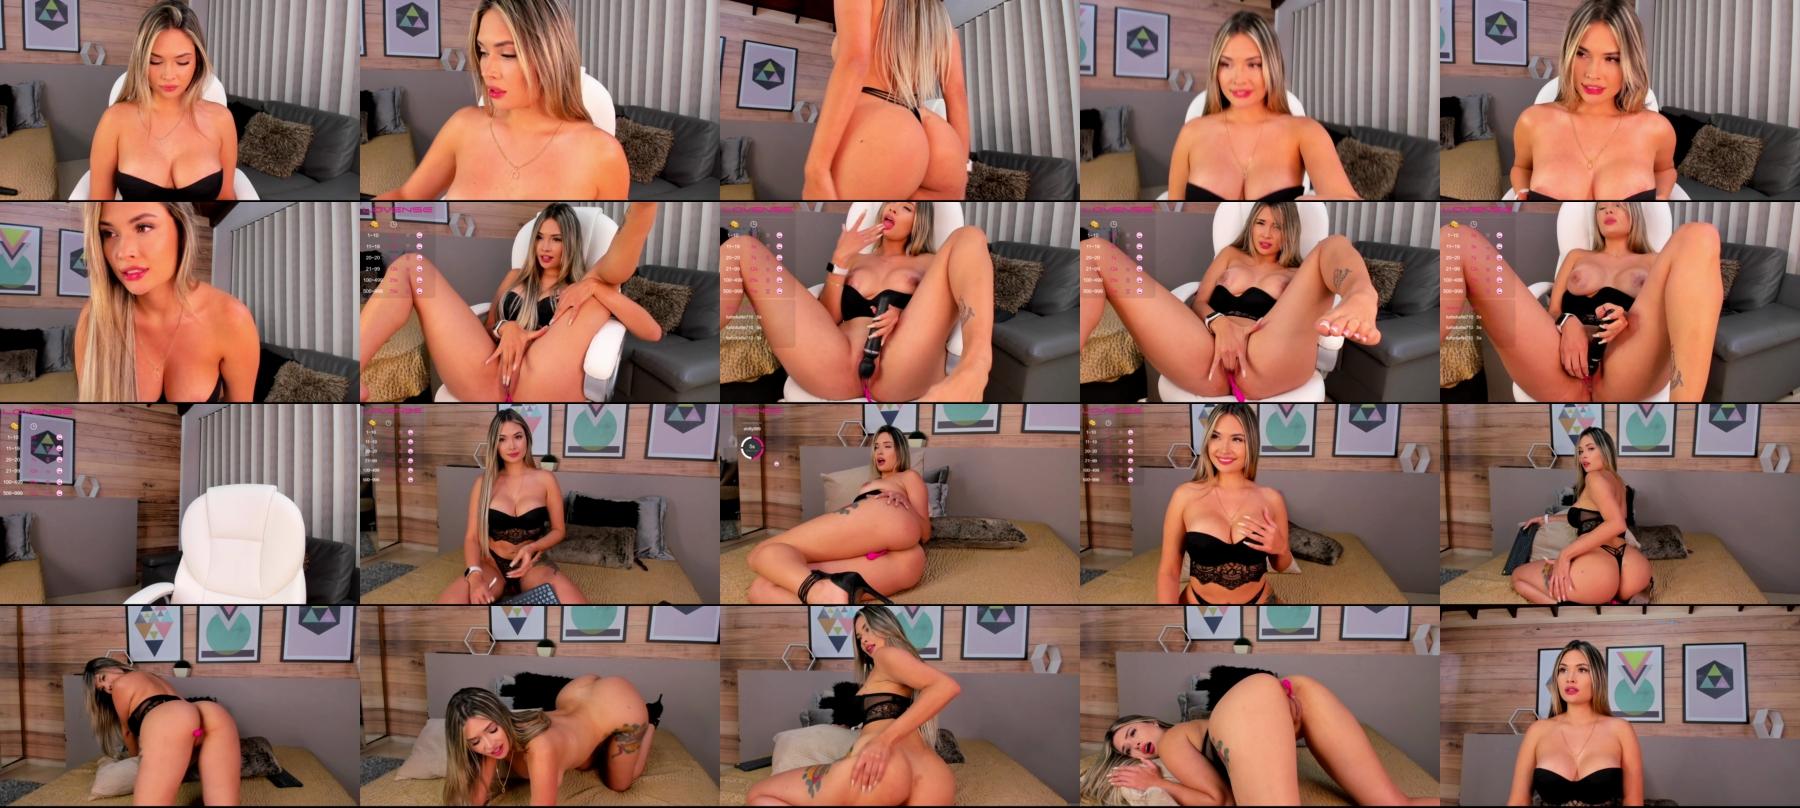 AnaCarrera Nude CAM SHOW @ Stripchat 13-10-2021